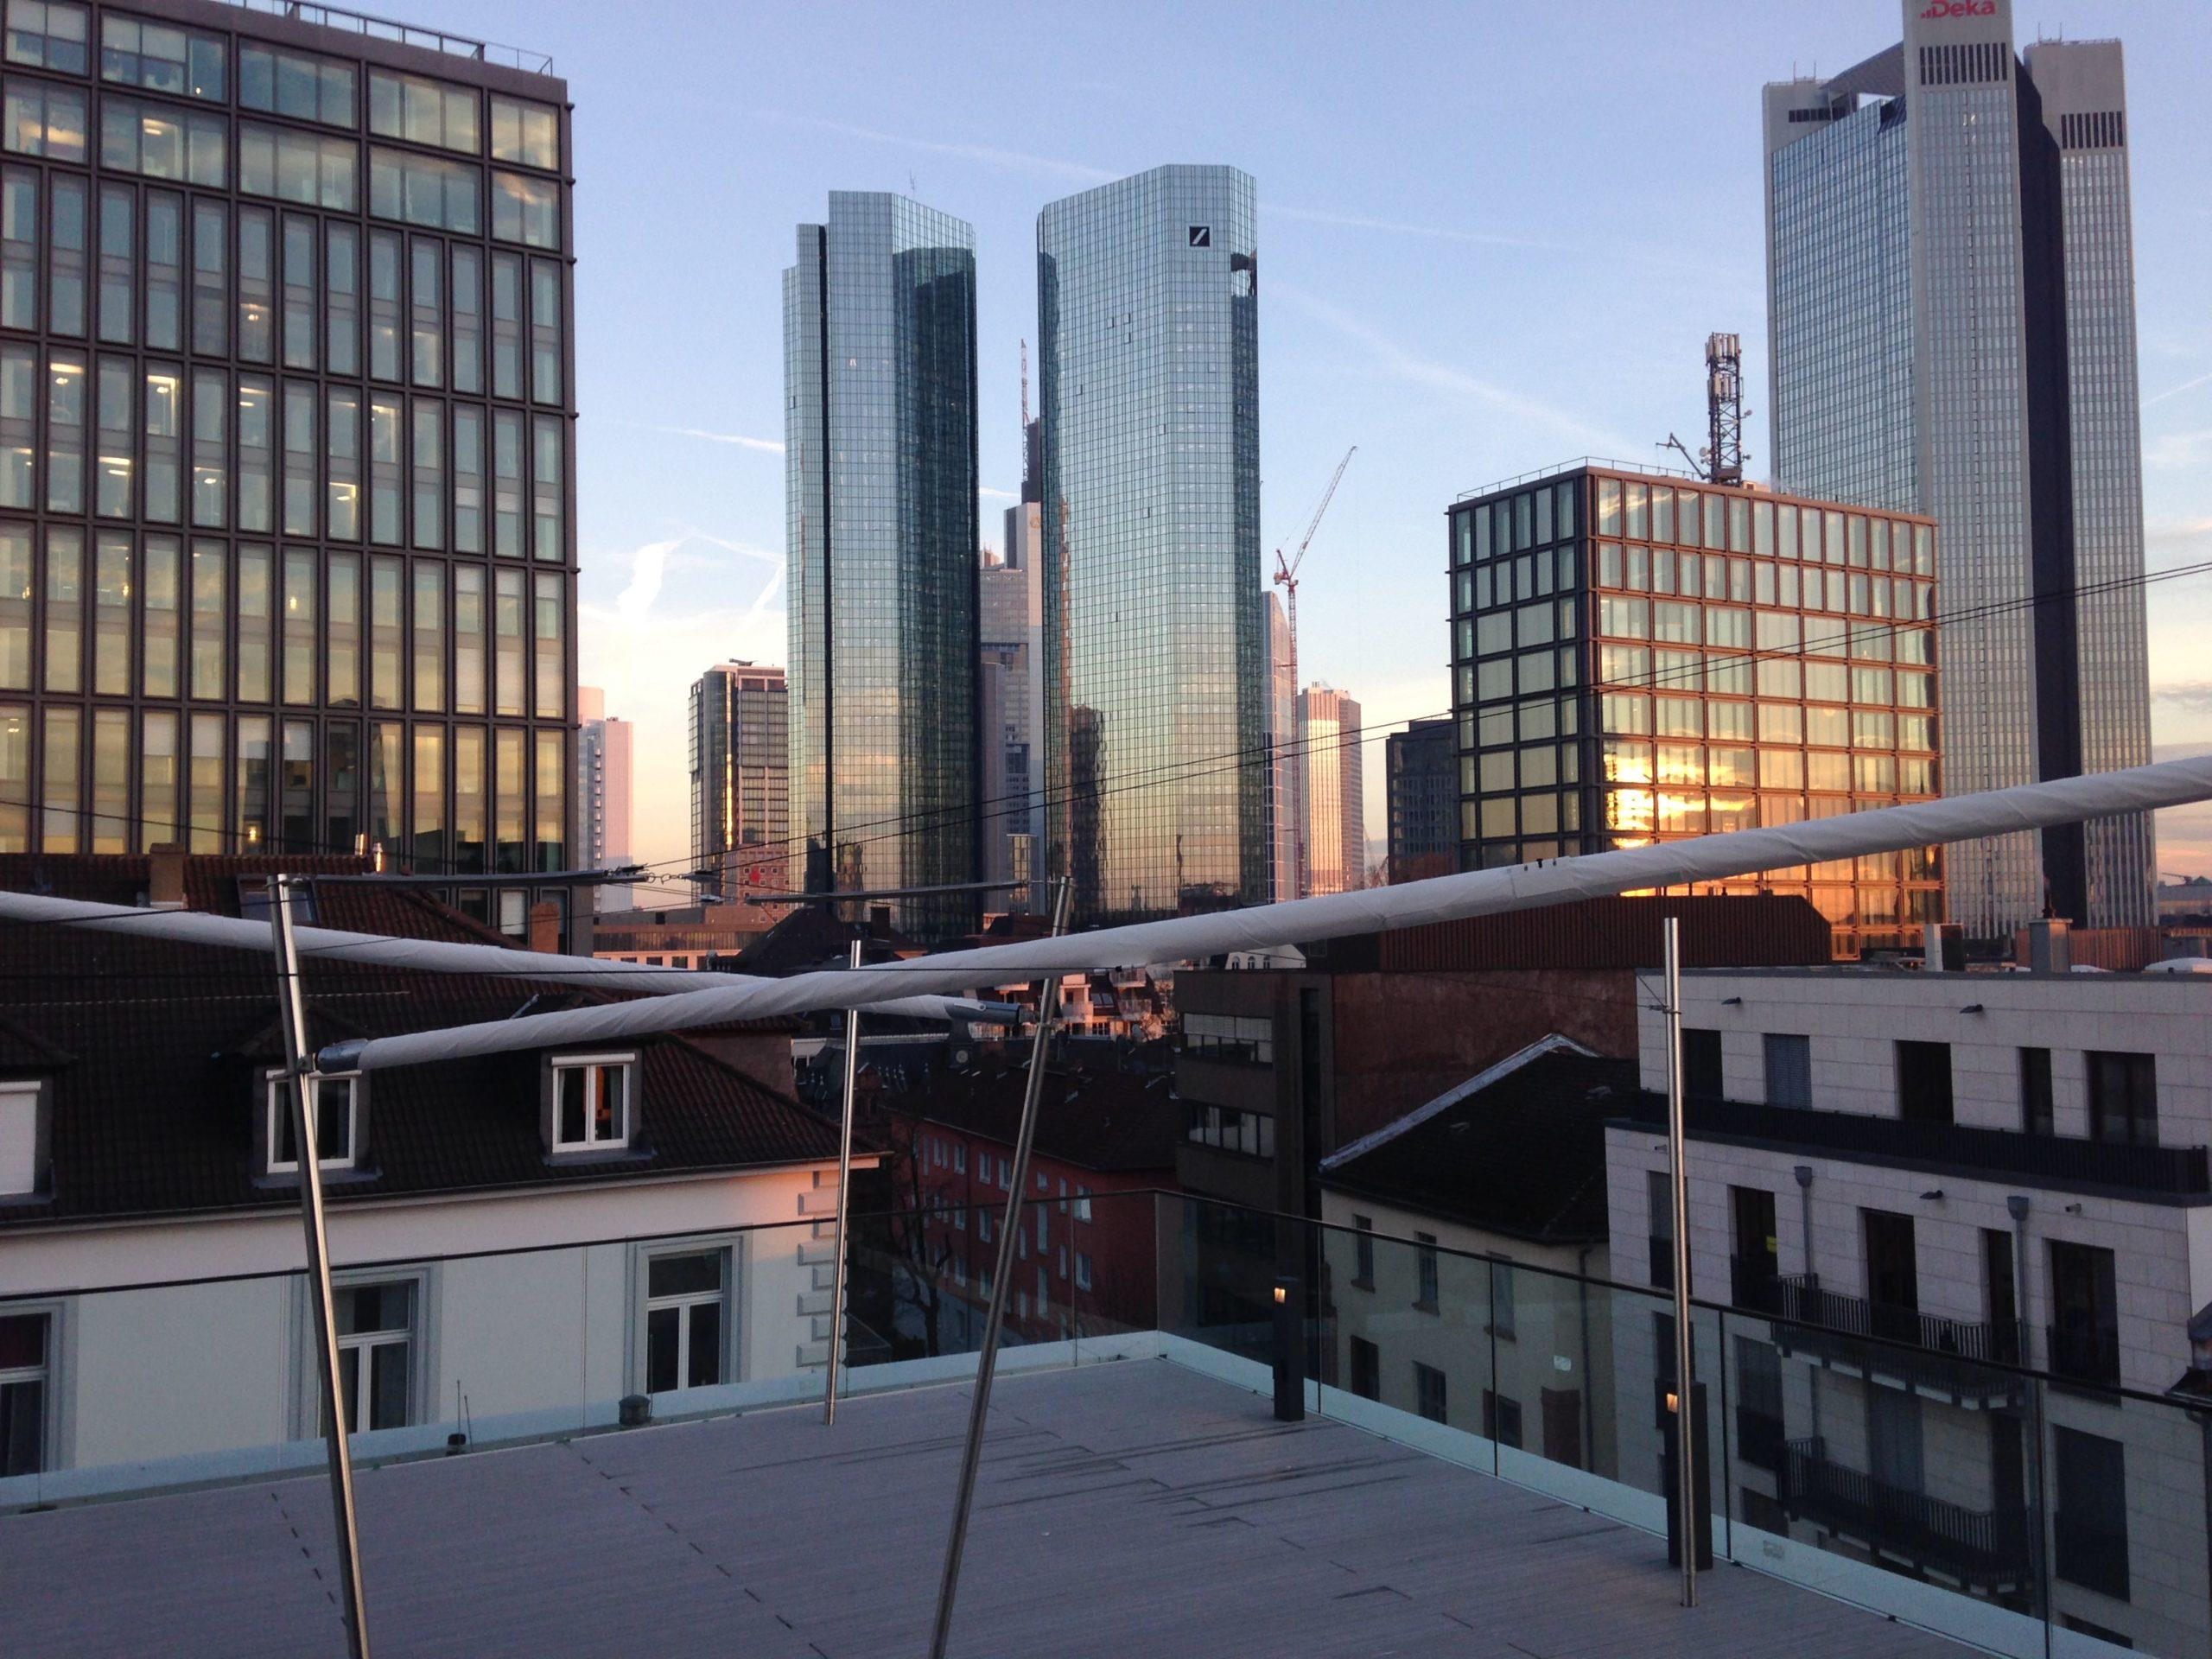 Barckhausstraße Frankfurt